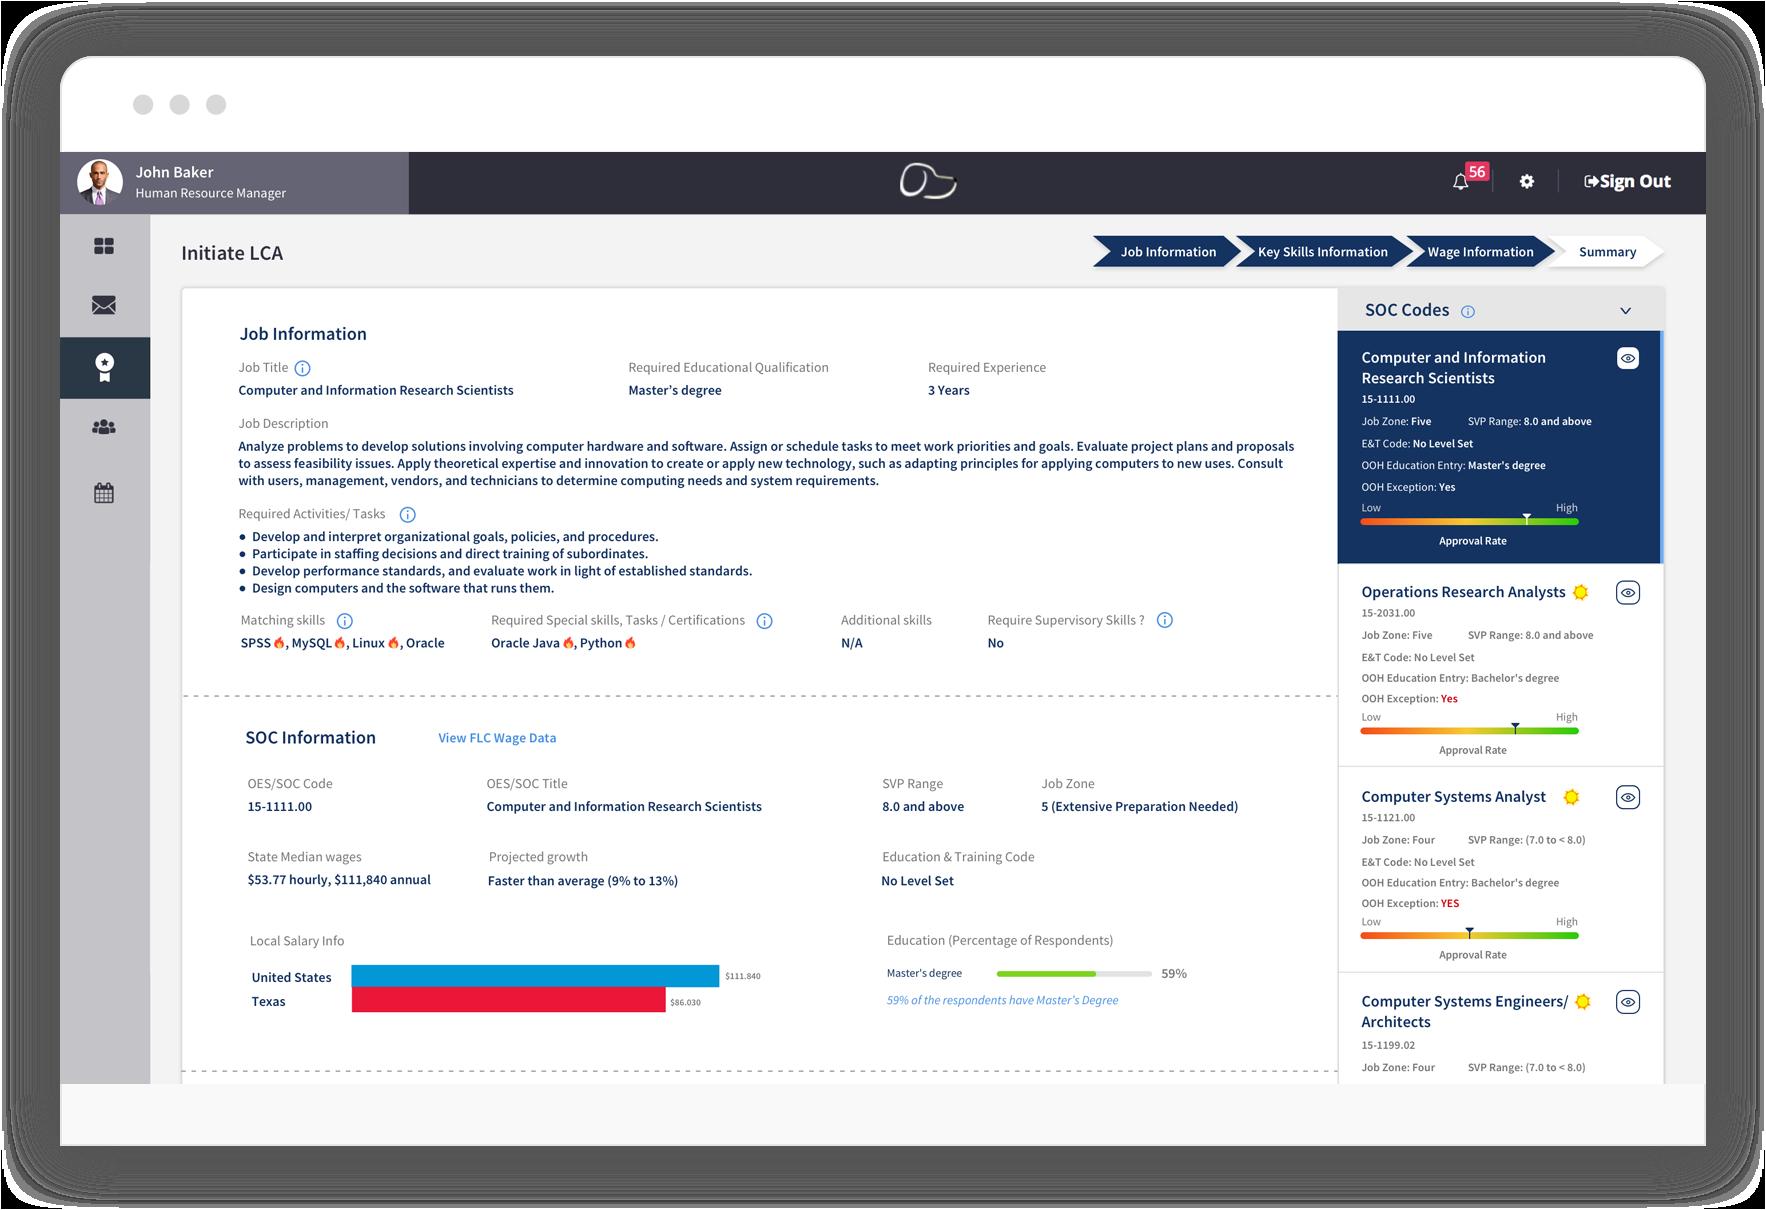 I9 Form|Immigration Software|LCA|SOC Codes|H1B|I983 Form